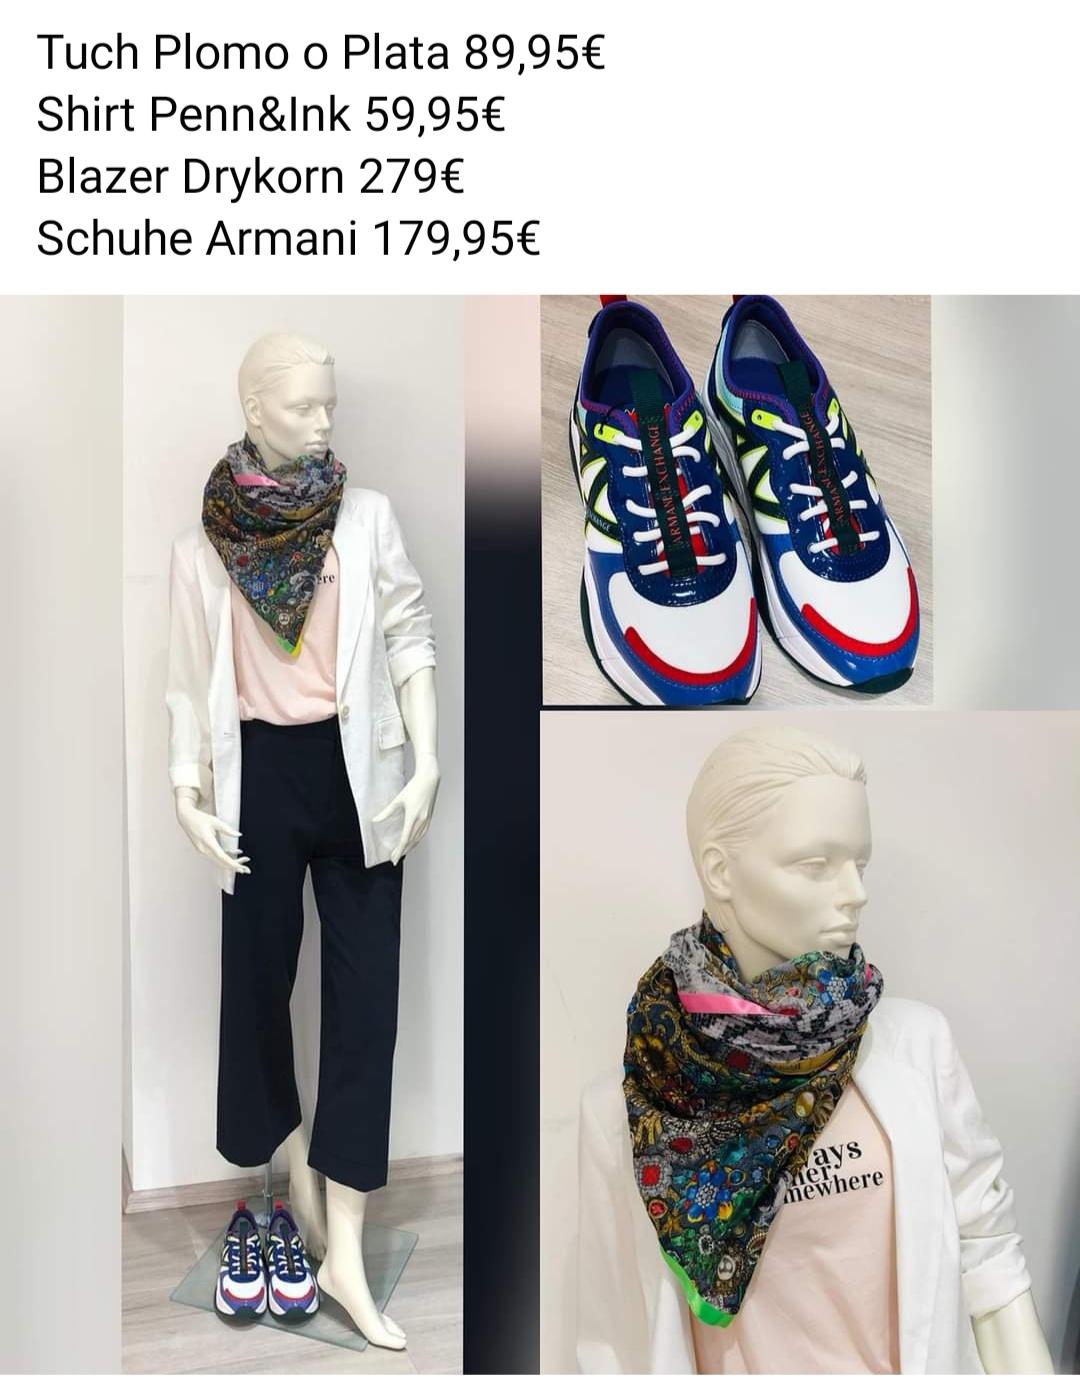 Blazer Drykorn